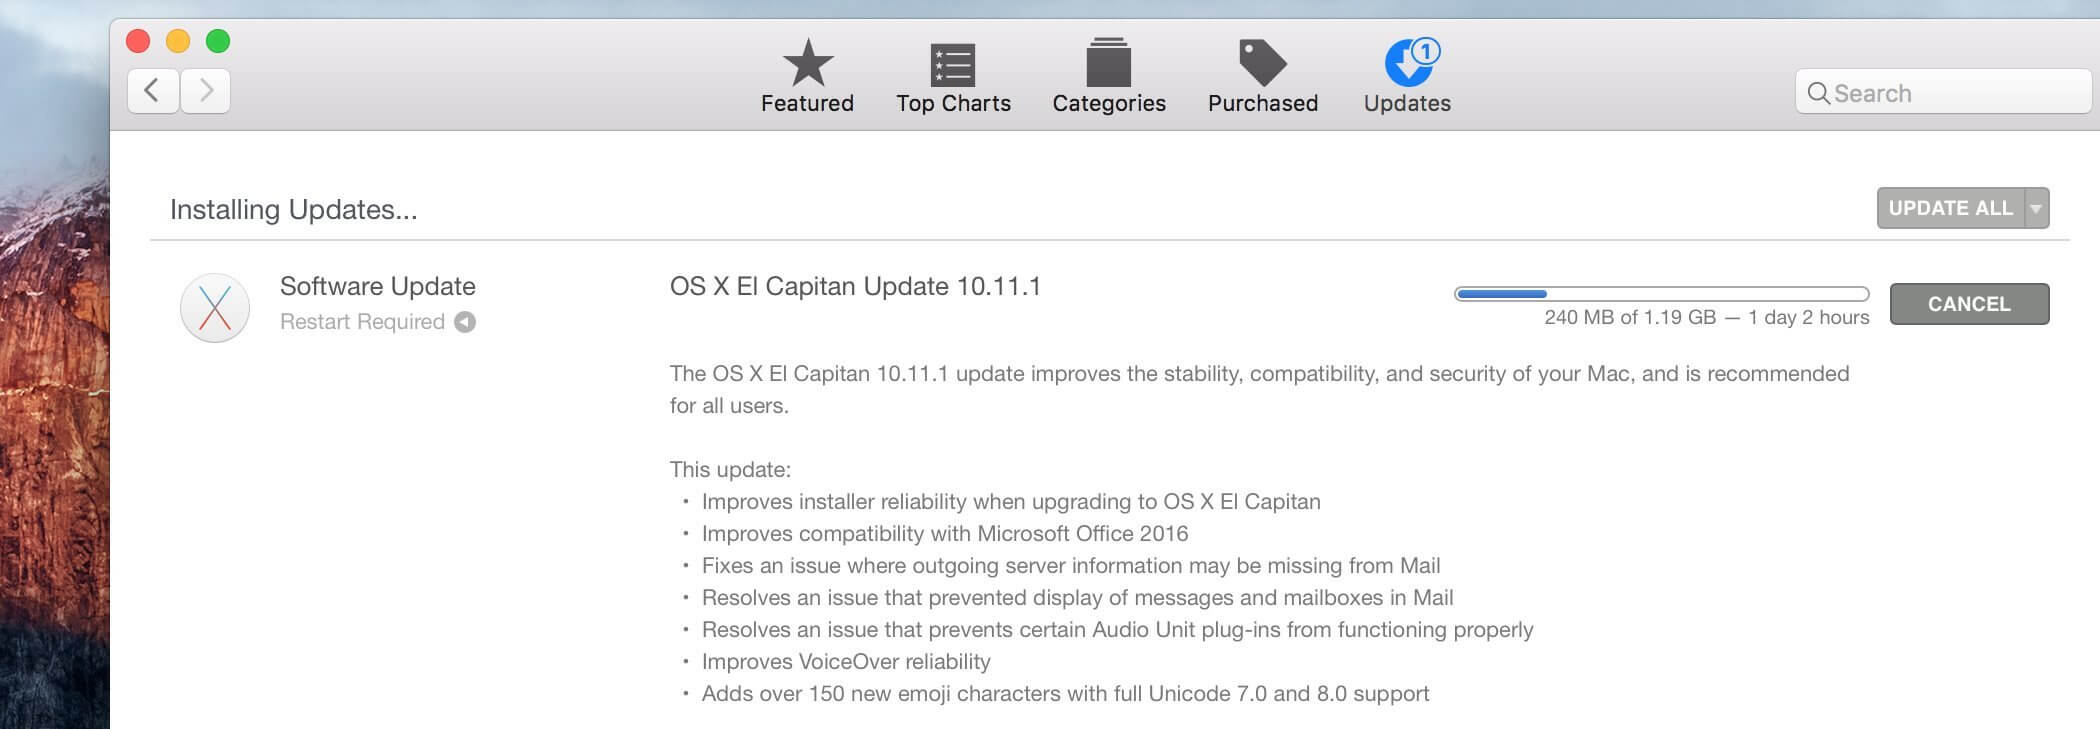 Actualización de OS X El Capitan